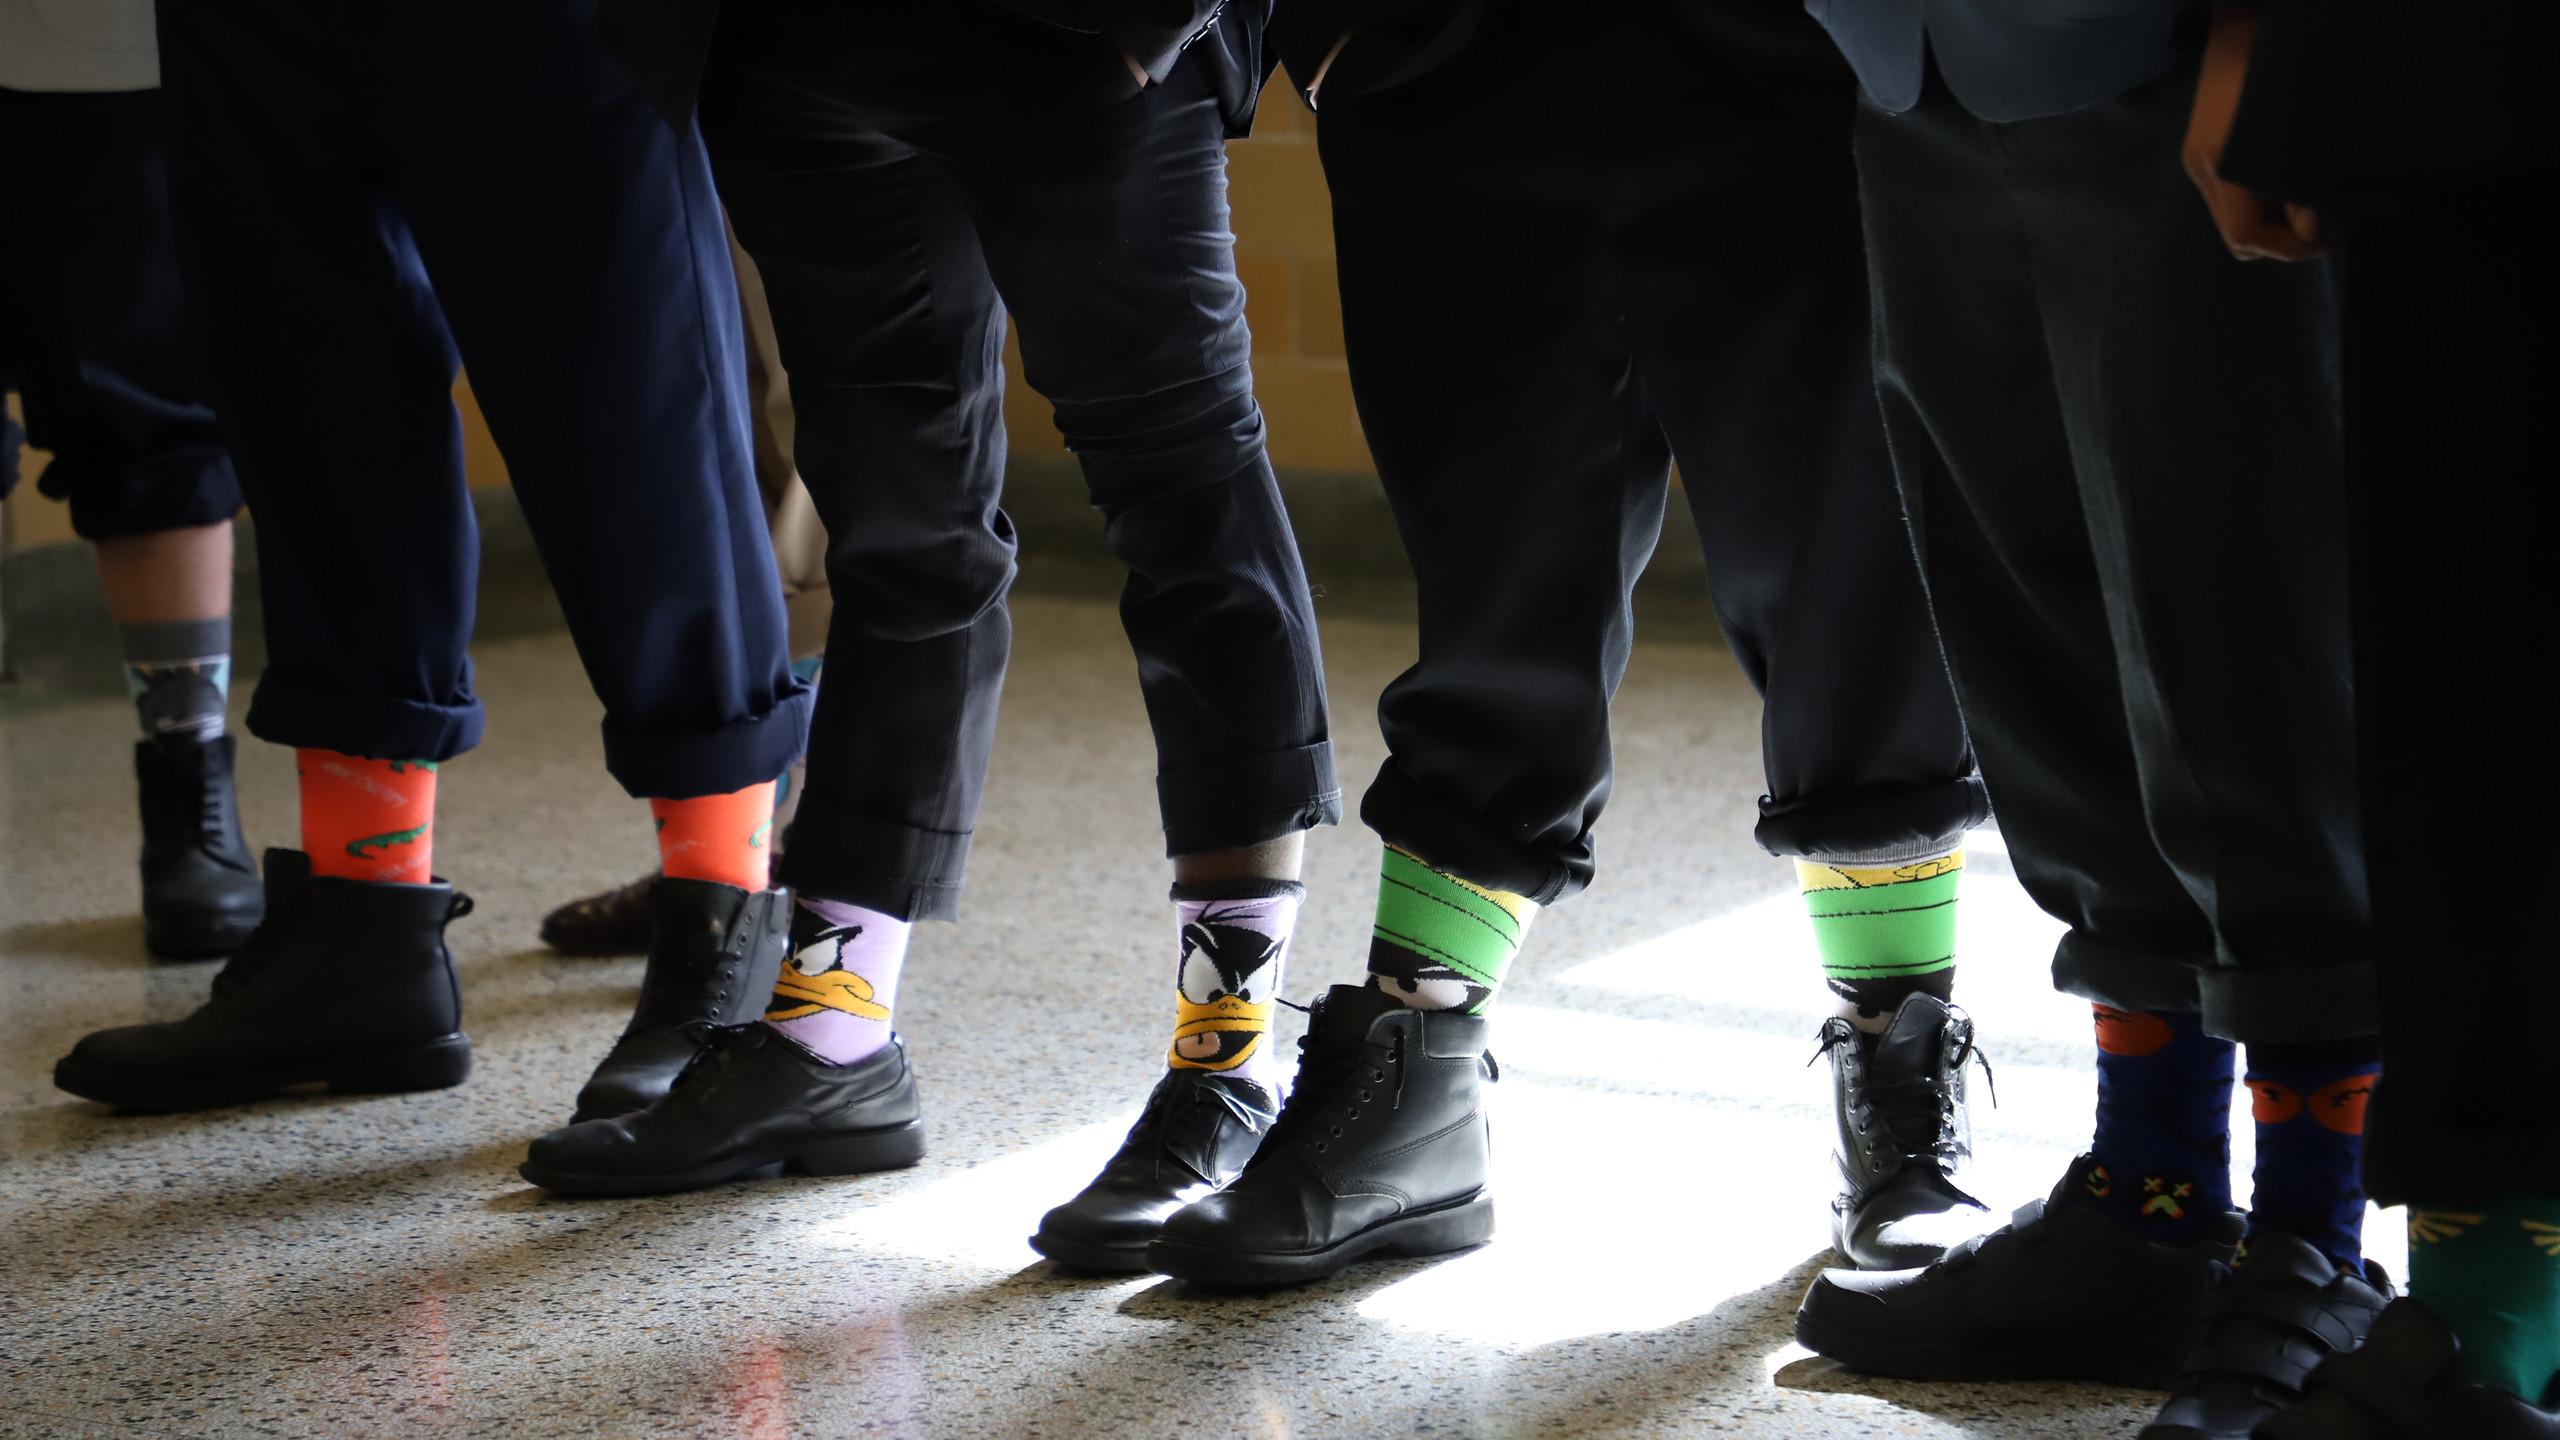 Fancy Socks Displayed